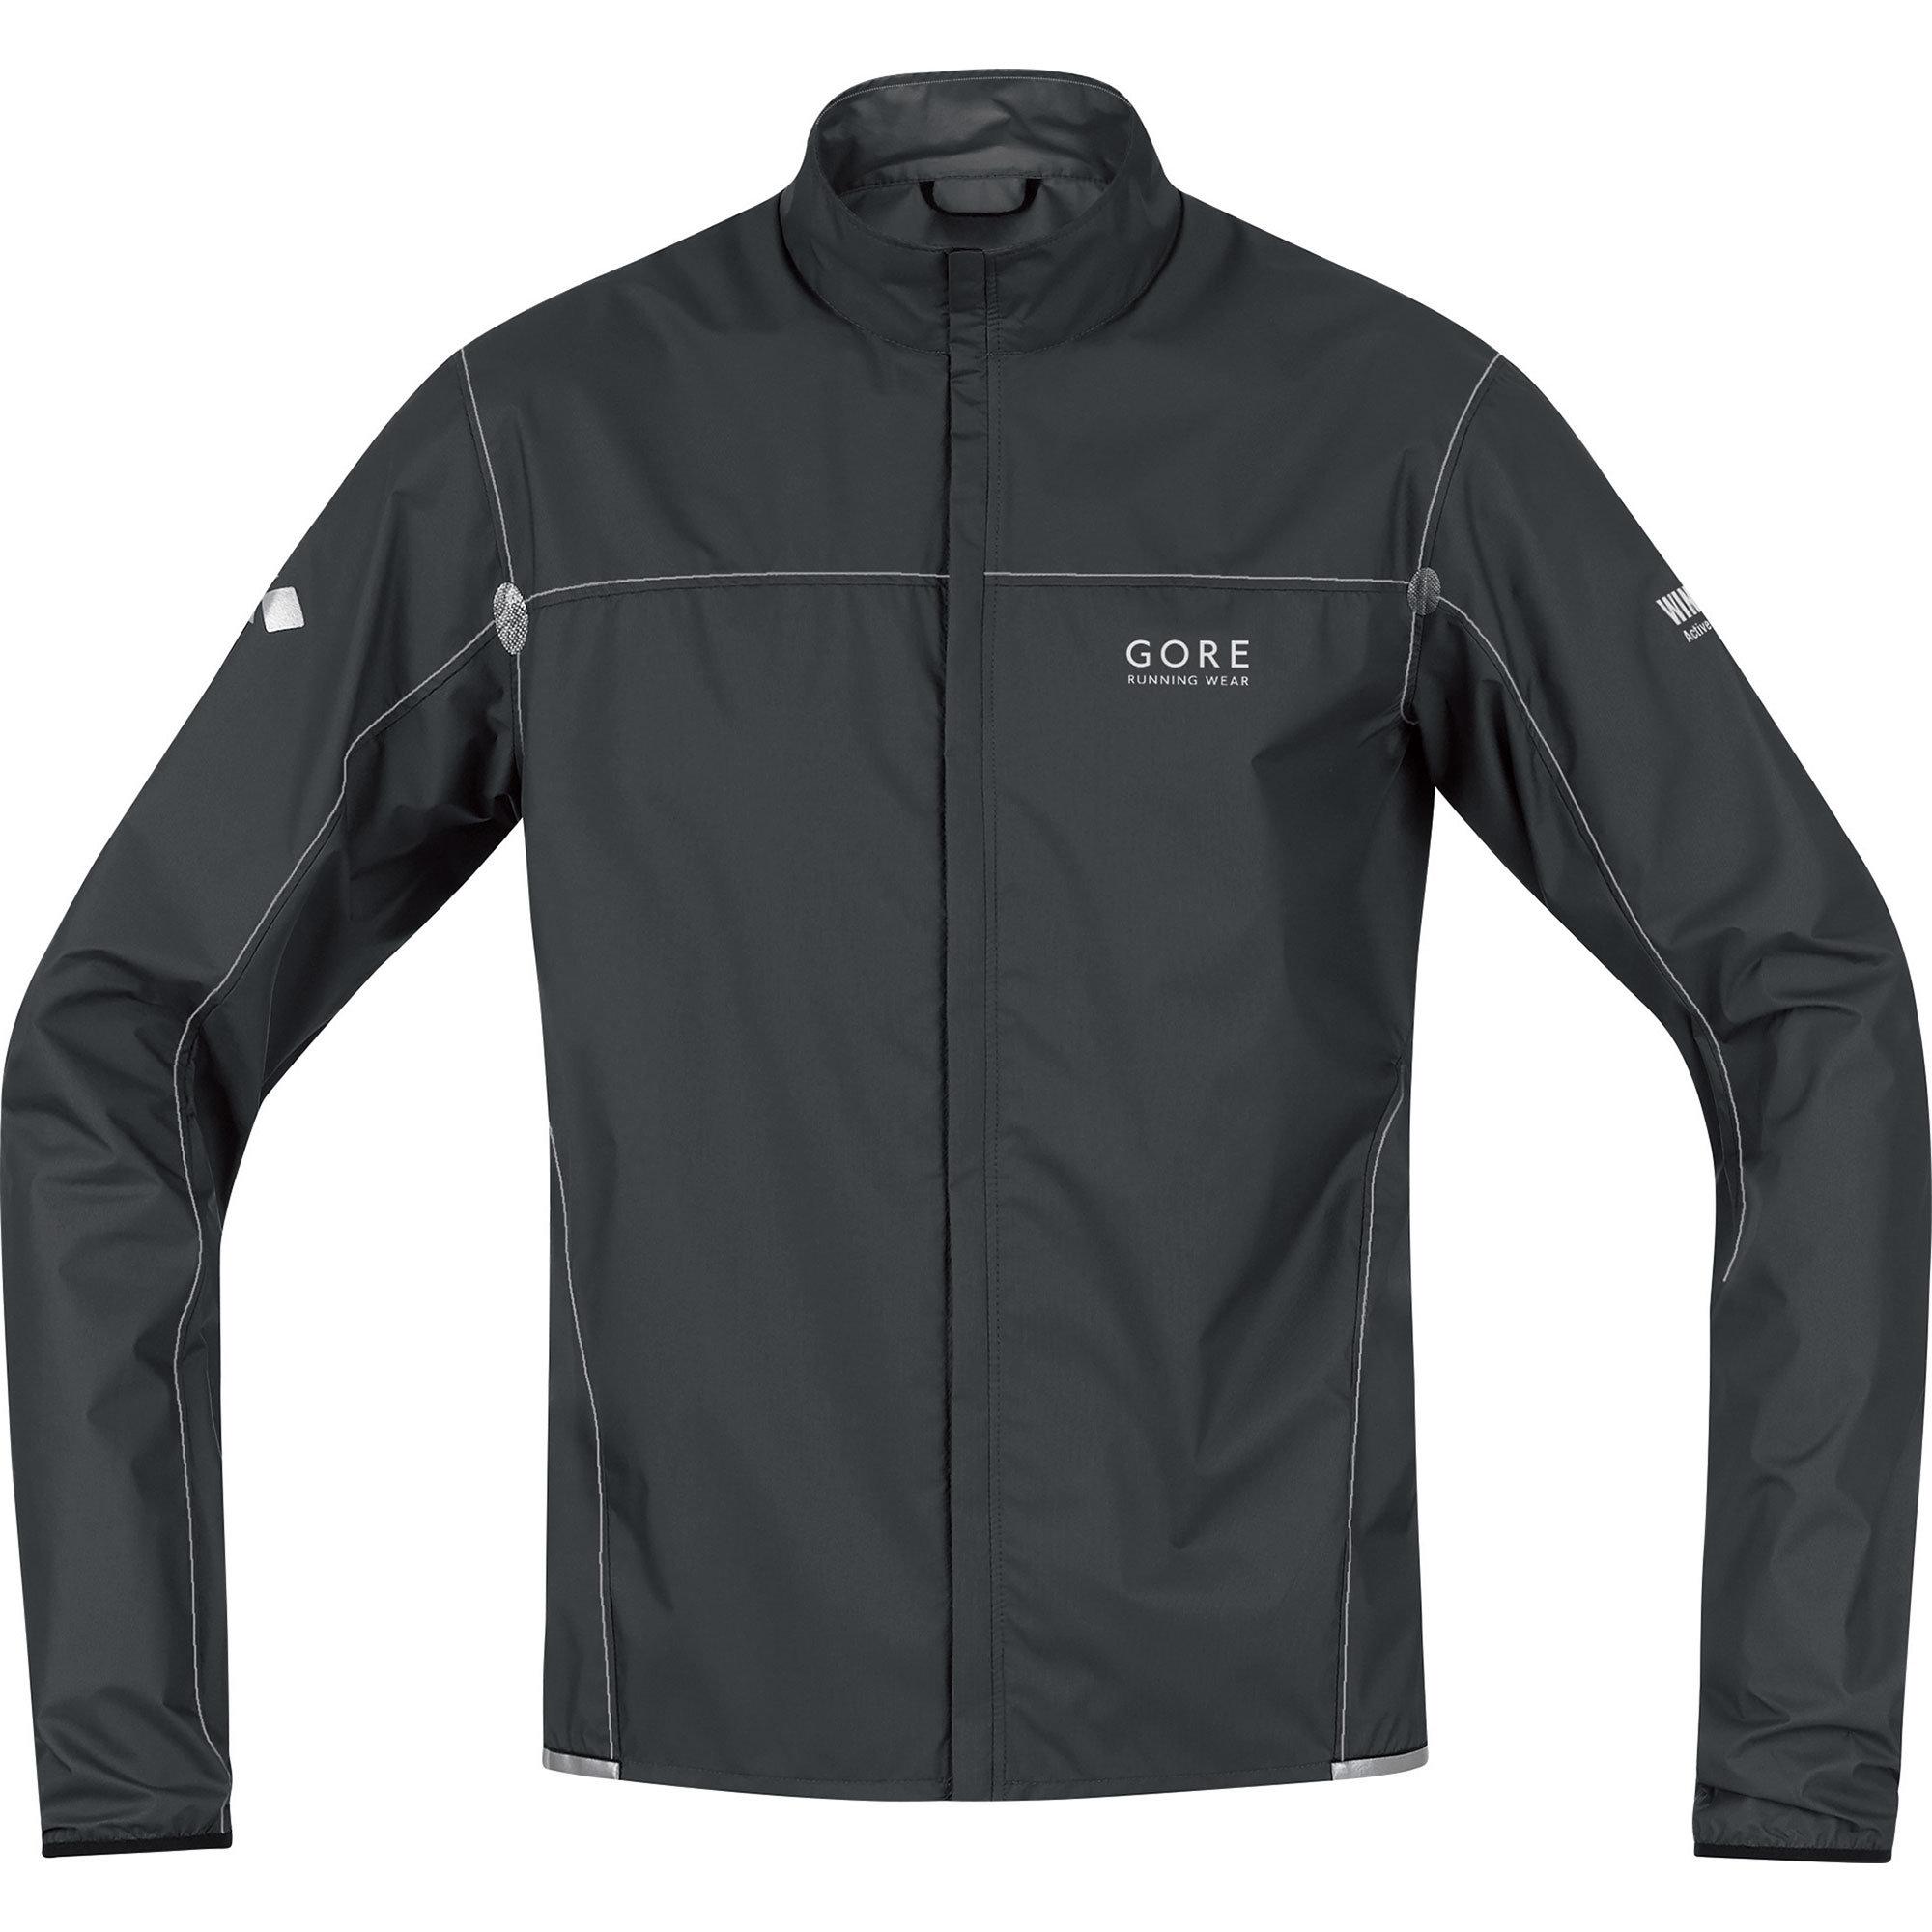 Gore X-RUNNING LIGHT AS Jacke in Black/Silver Grey